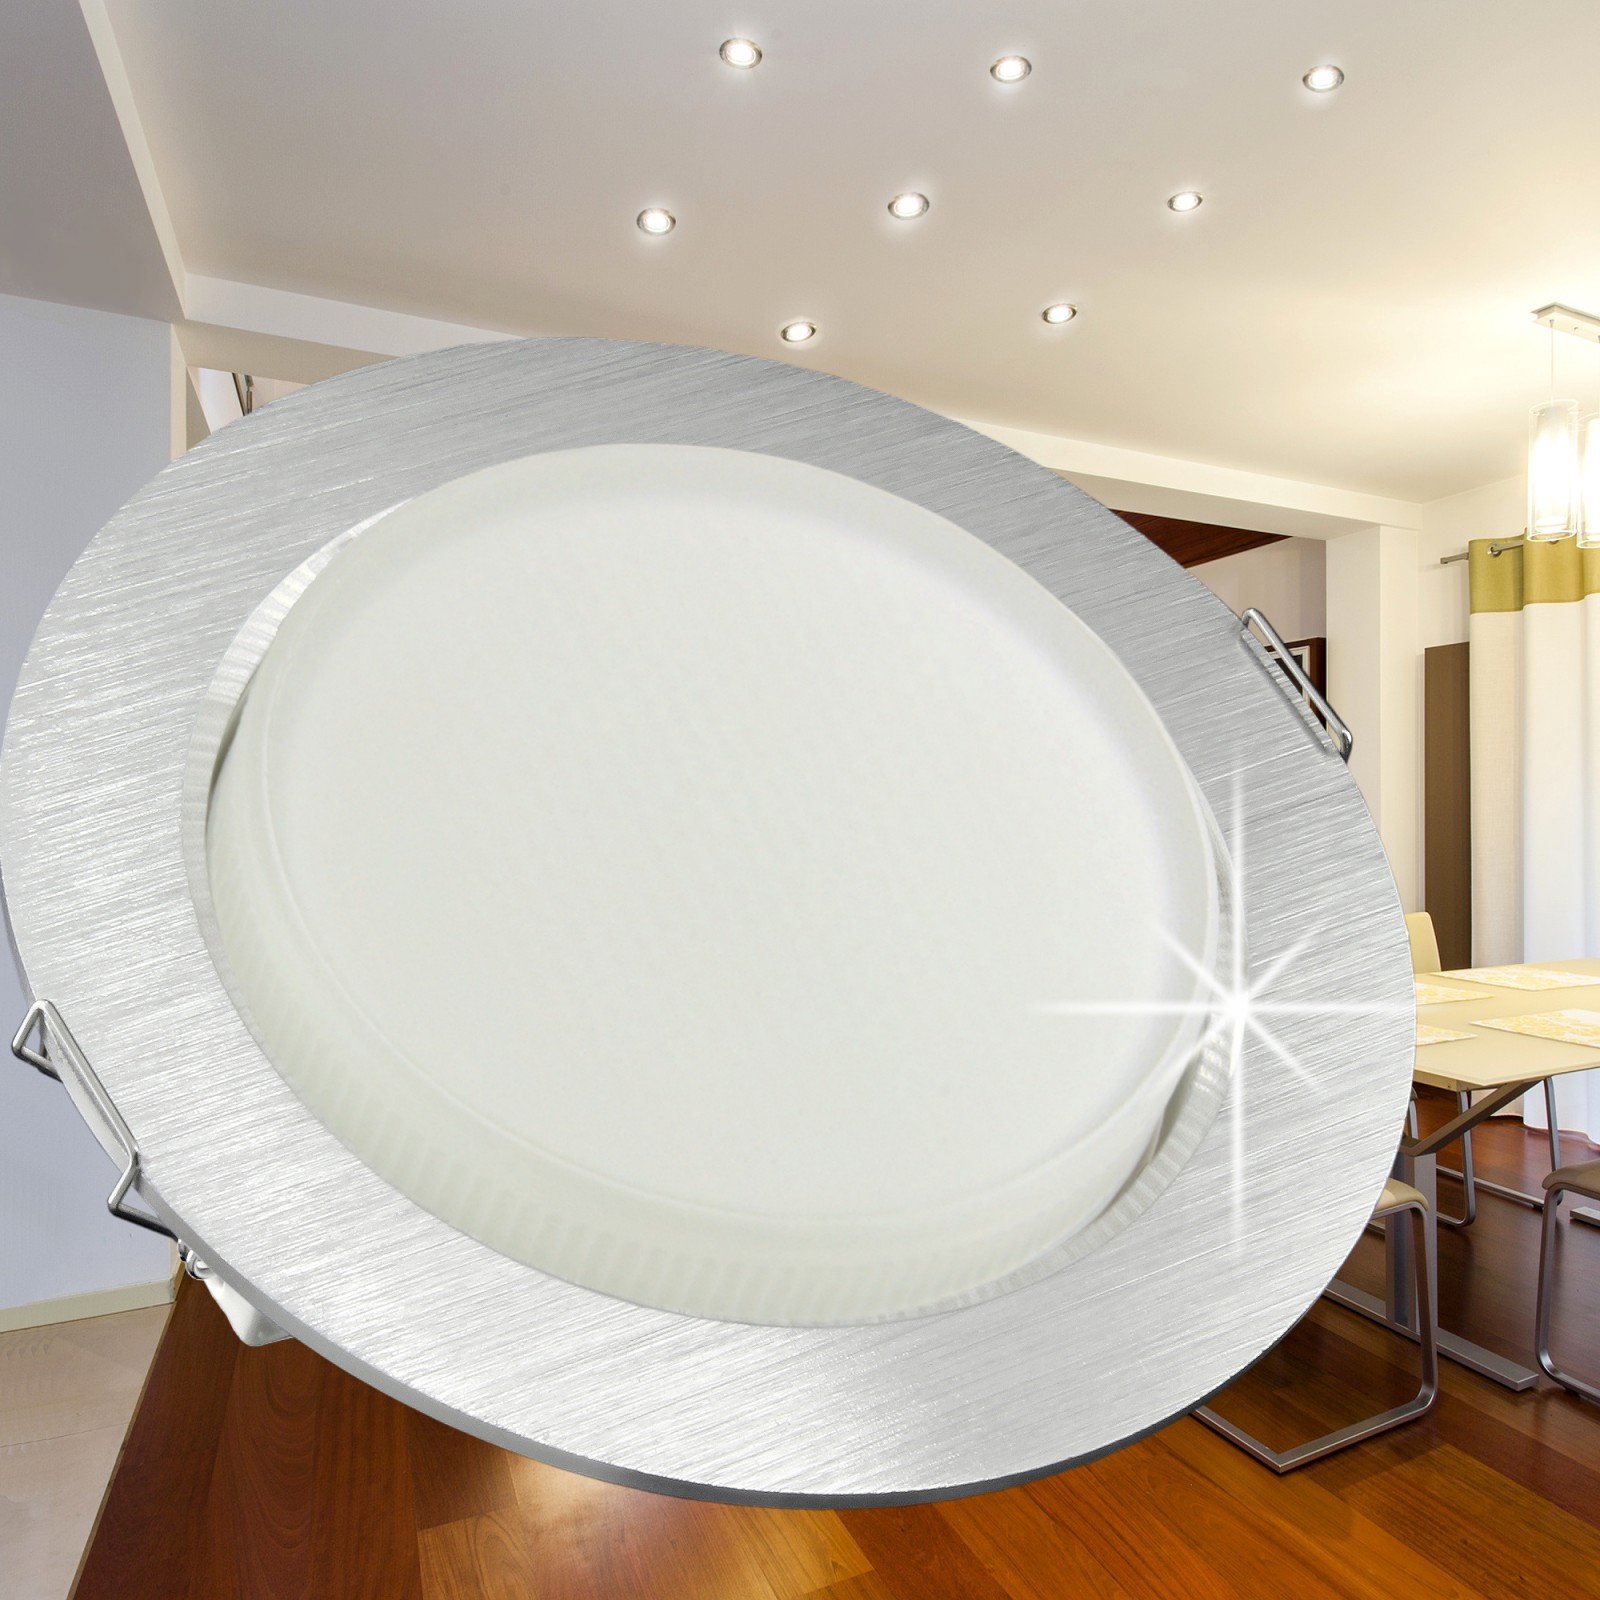 rx 3 alu led einbaustrahler einbauleuchte gx53 3 5w smd leds warm weiss 230v ebay. Black Bedroom Furniture Sets. Home Design Ideas